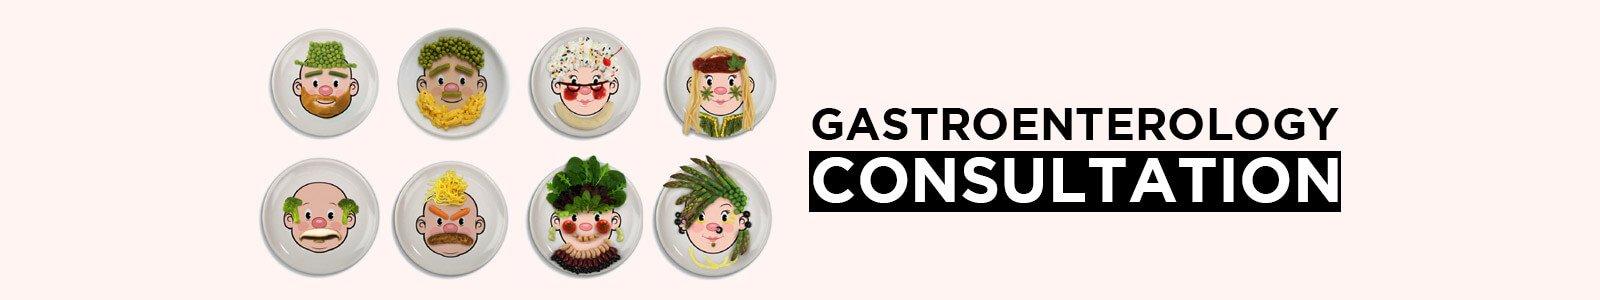 gastroenterology consulation